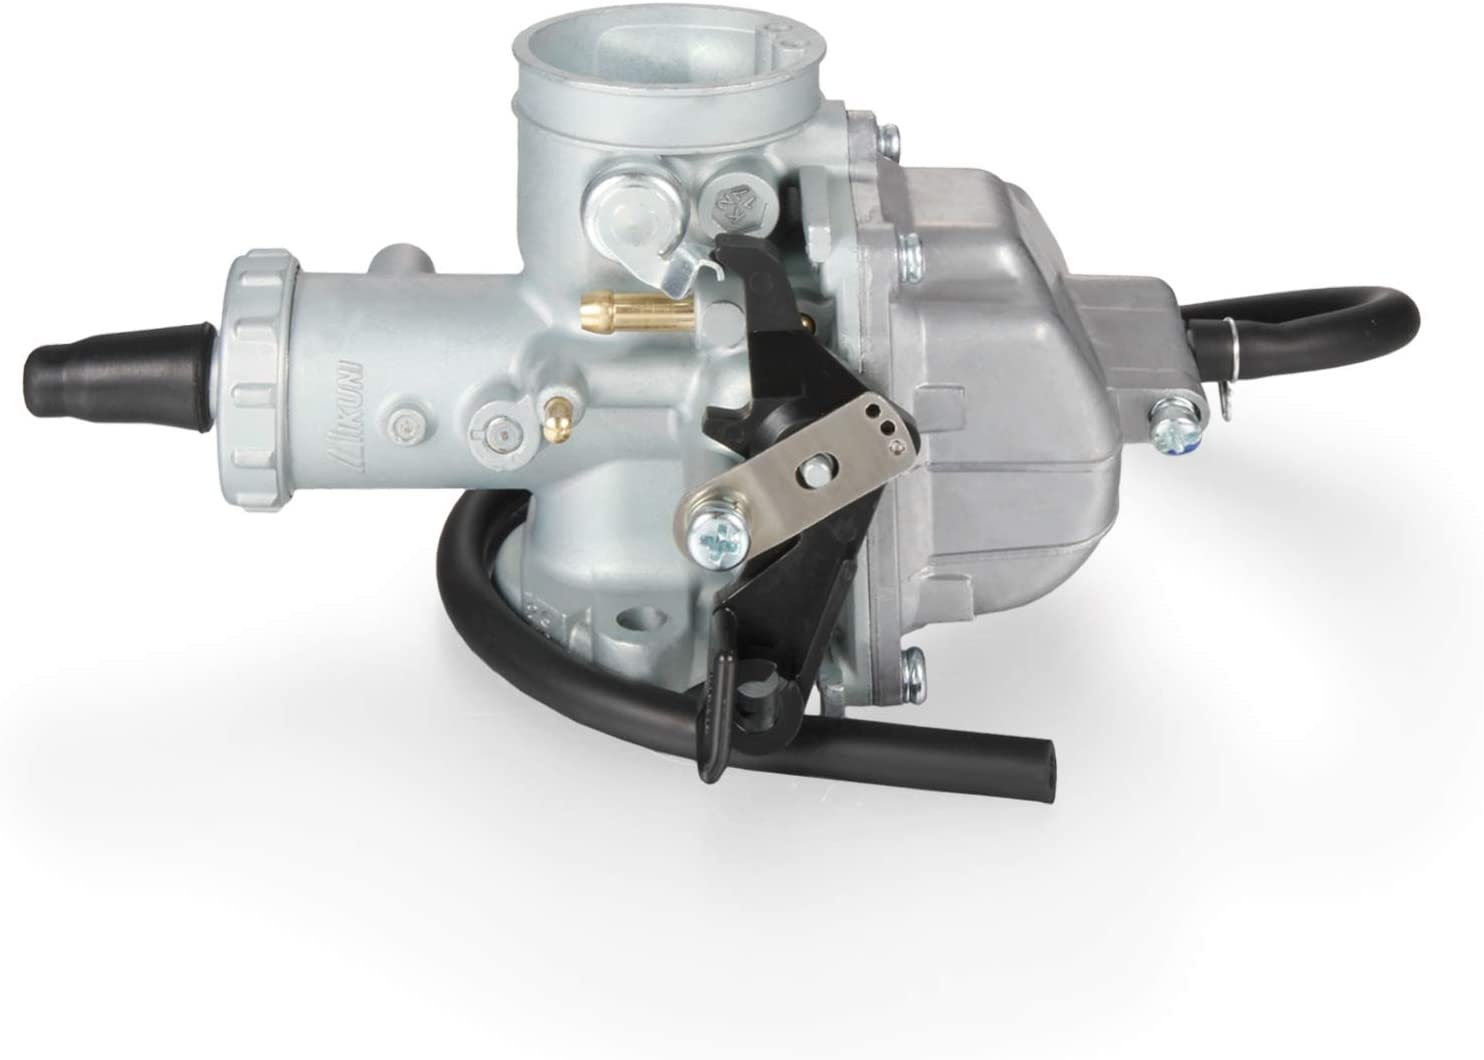 Dromedary Carburetor Vergaser Mikuni 4 Takt Quad Und Pit Bike Motor Auto